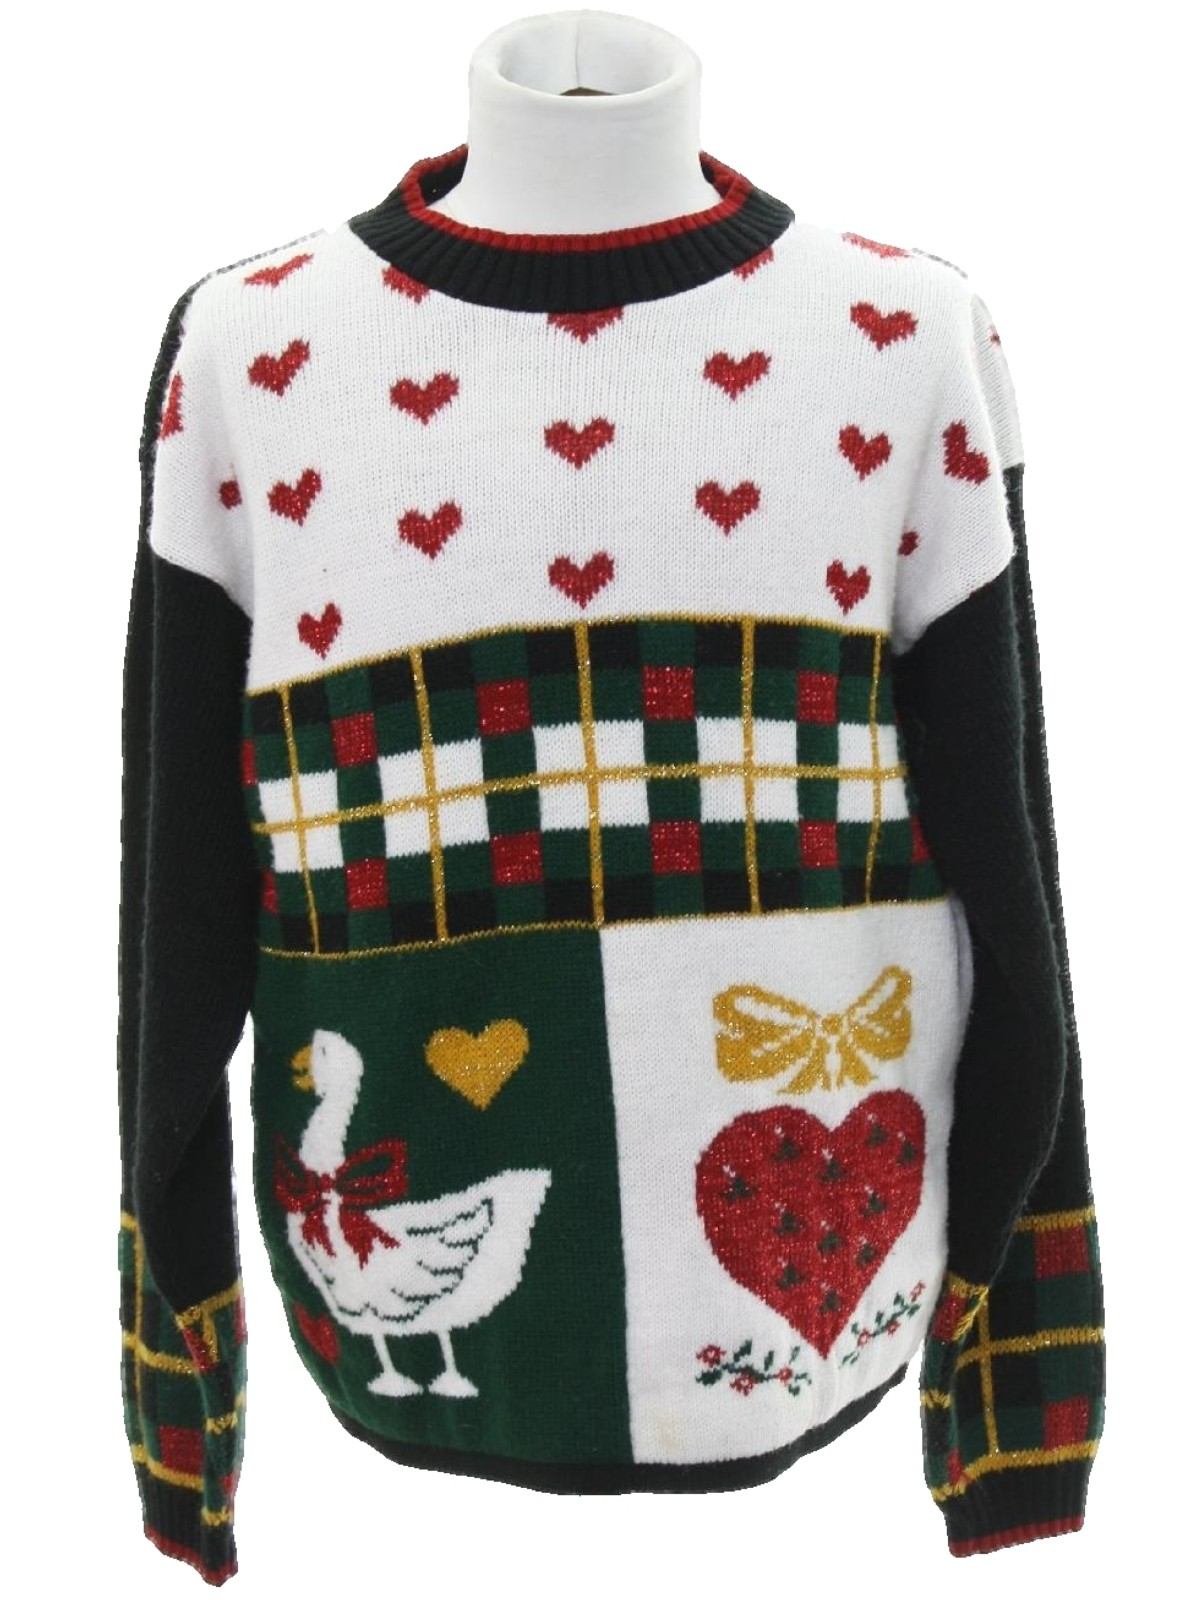 1980\u0027s Unisex Girls or Boys Vintage Ugly Christmas Sweater